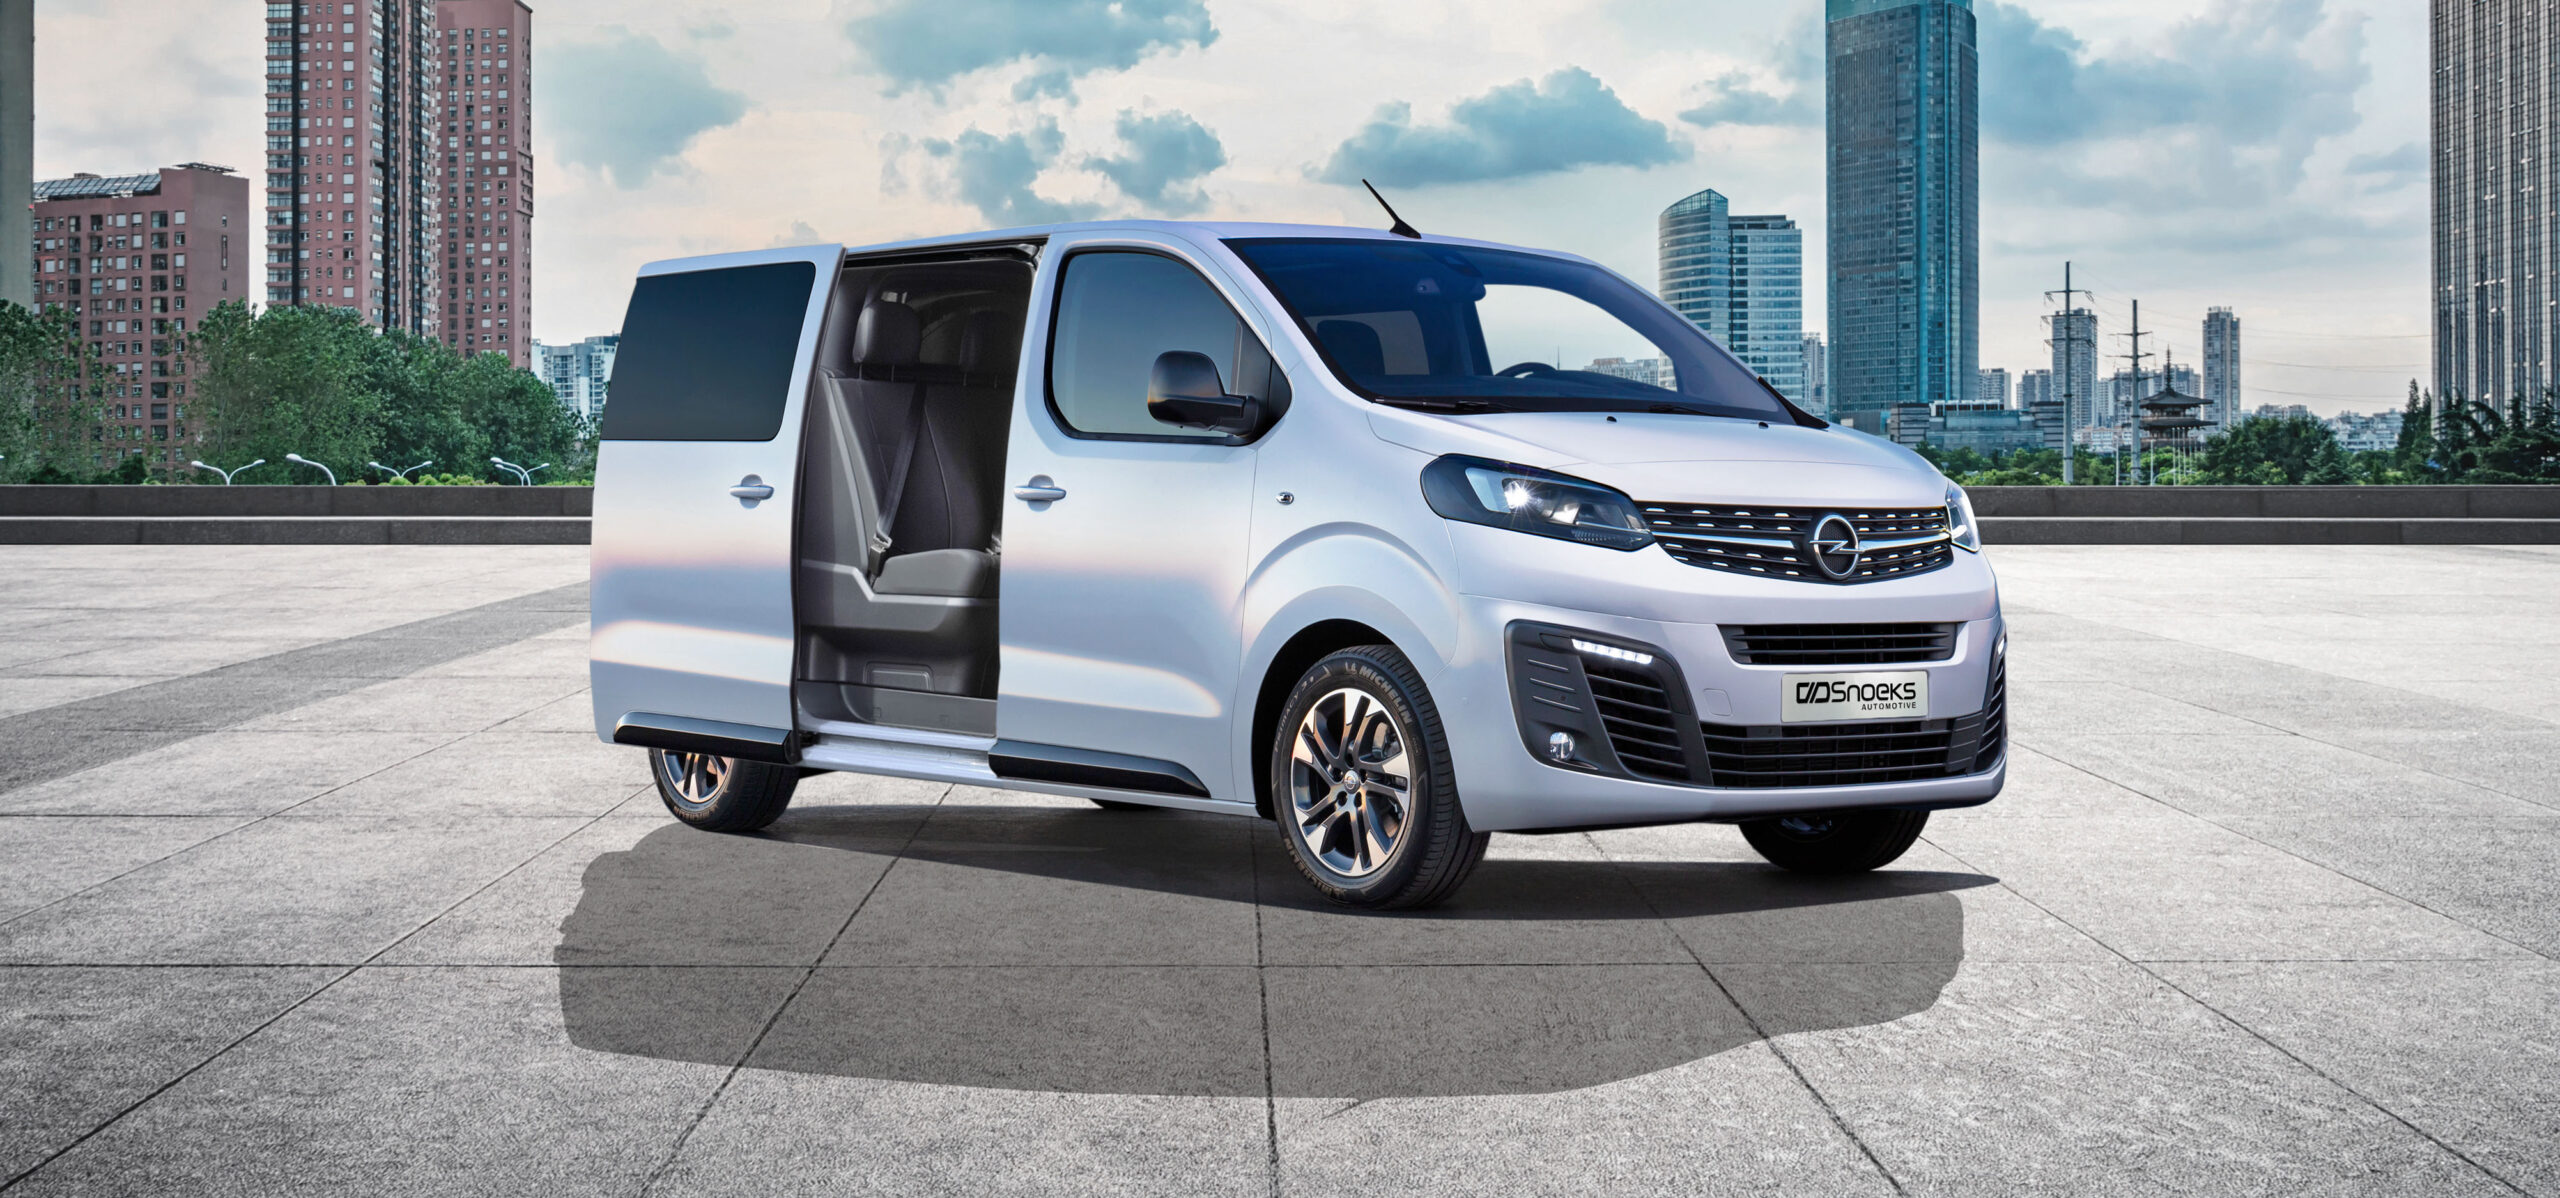 Opel Vivaro Crew Cab by Snoeks